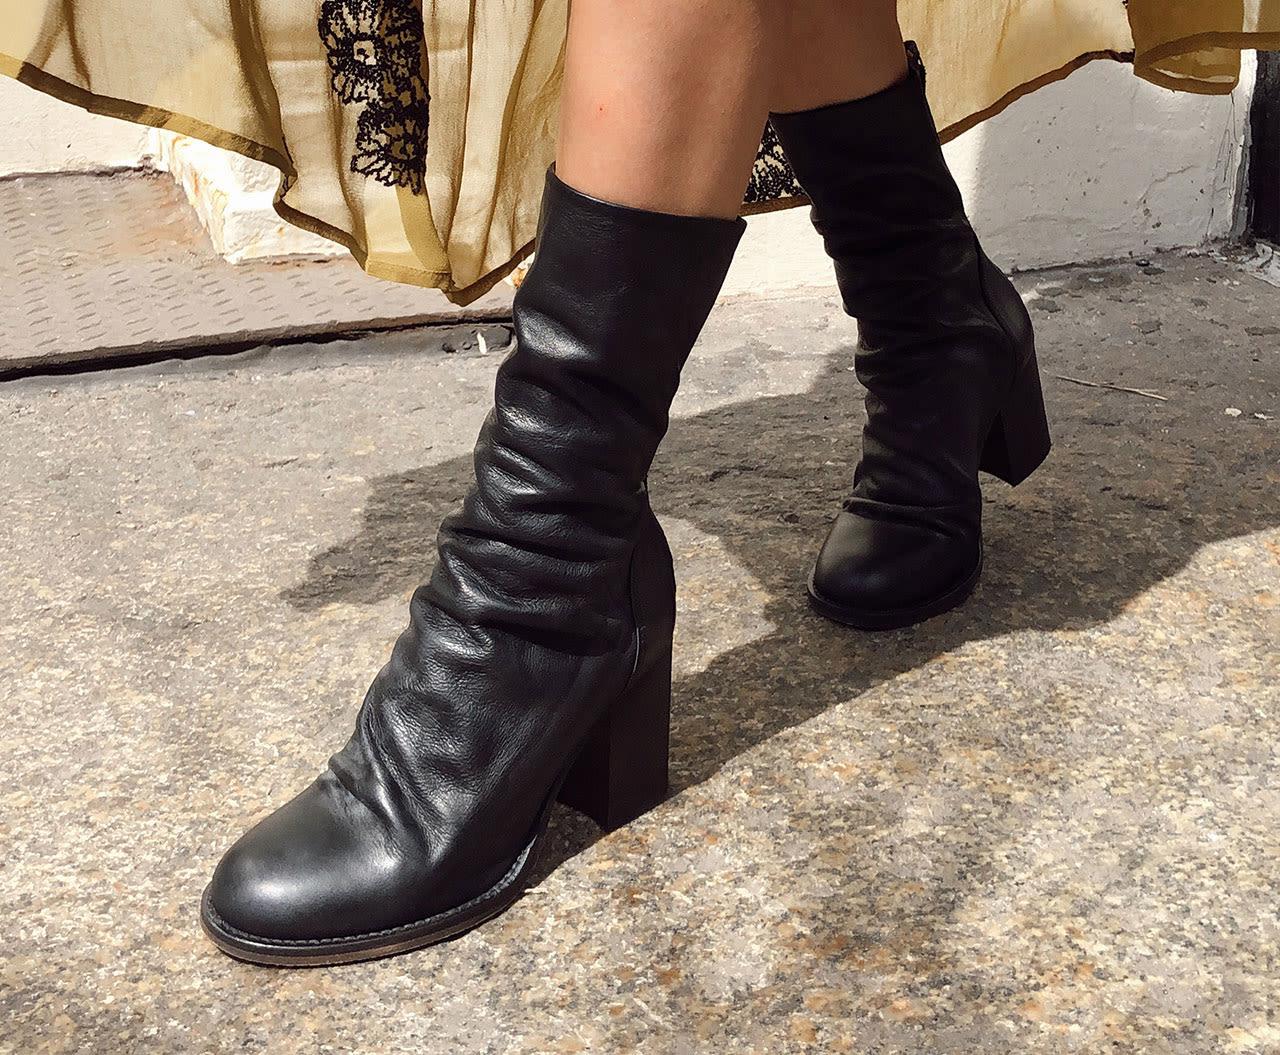 e68b612cef67 Fashionable Boots for Women